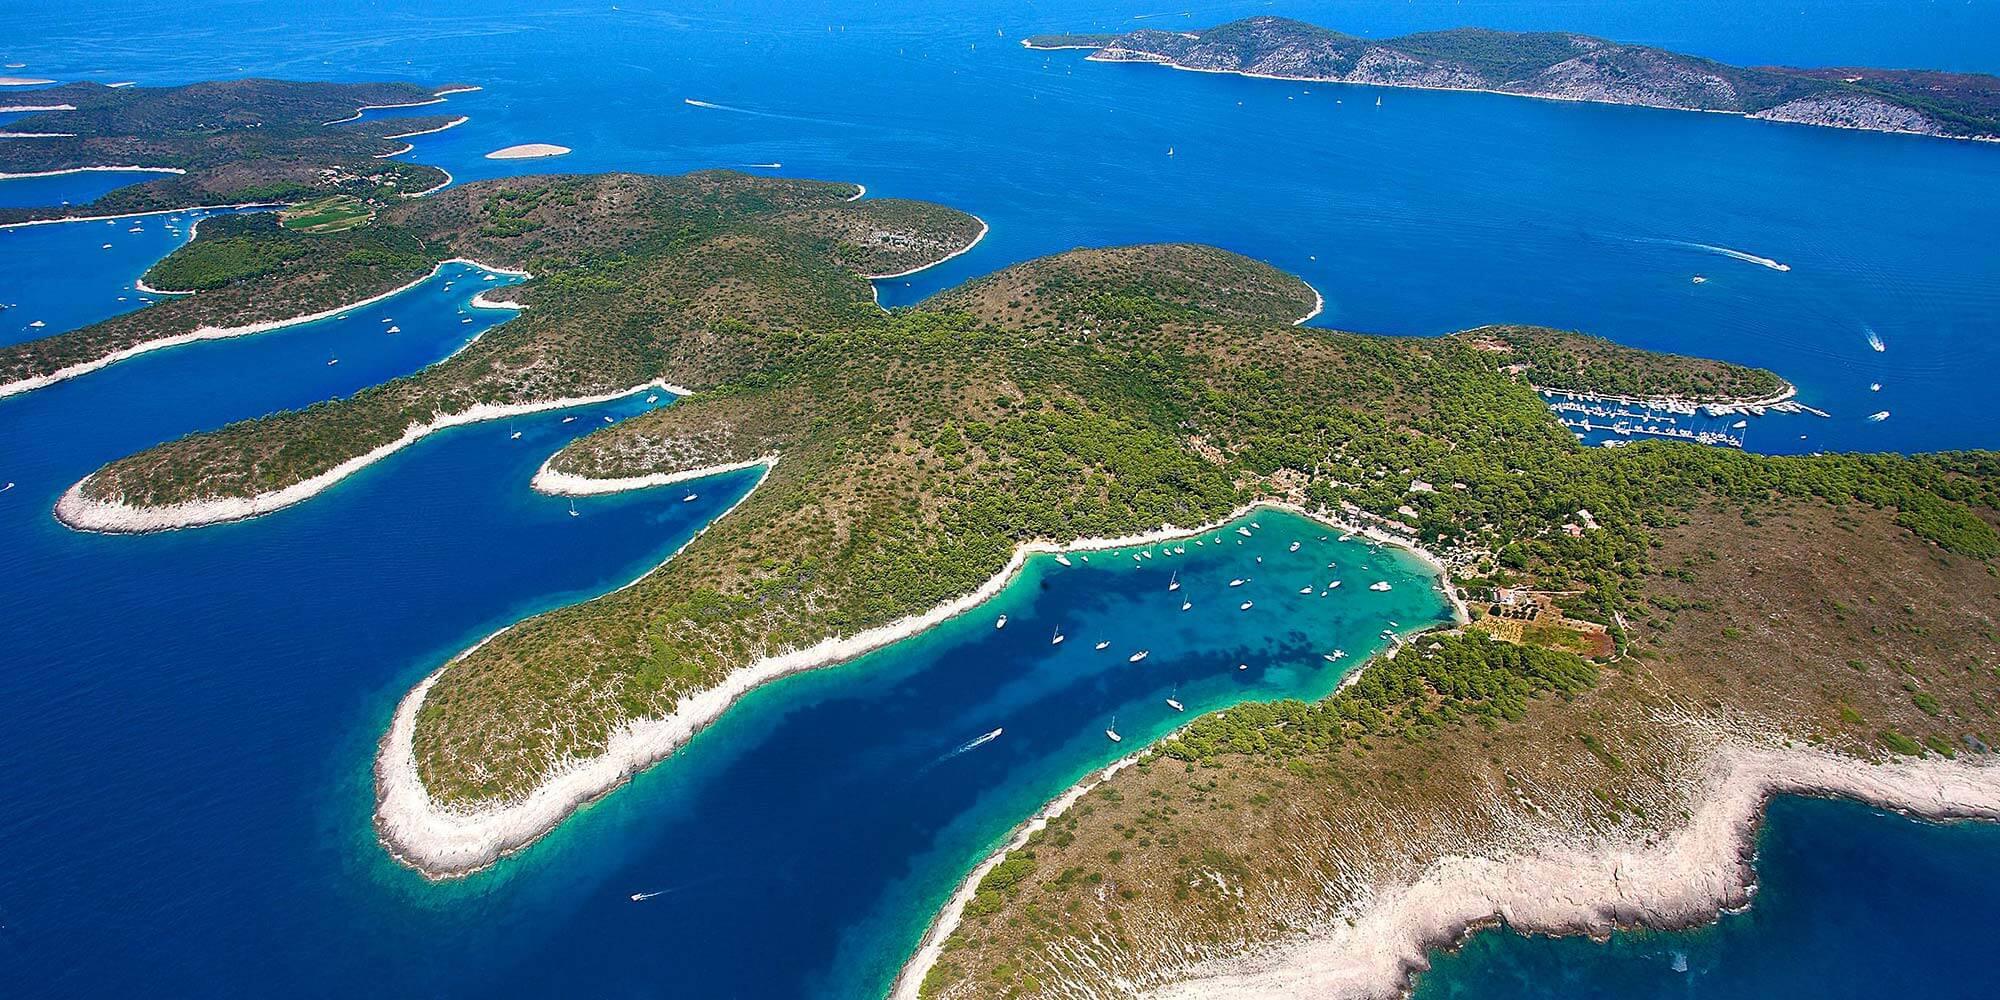 Sveti Klement, Pakleni Islands, Croatia